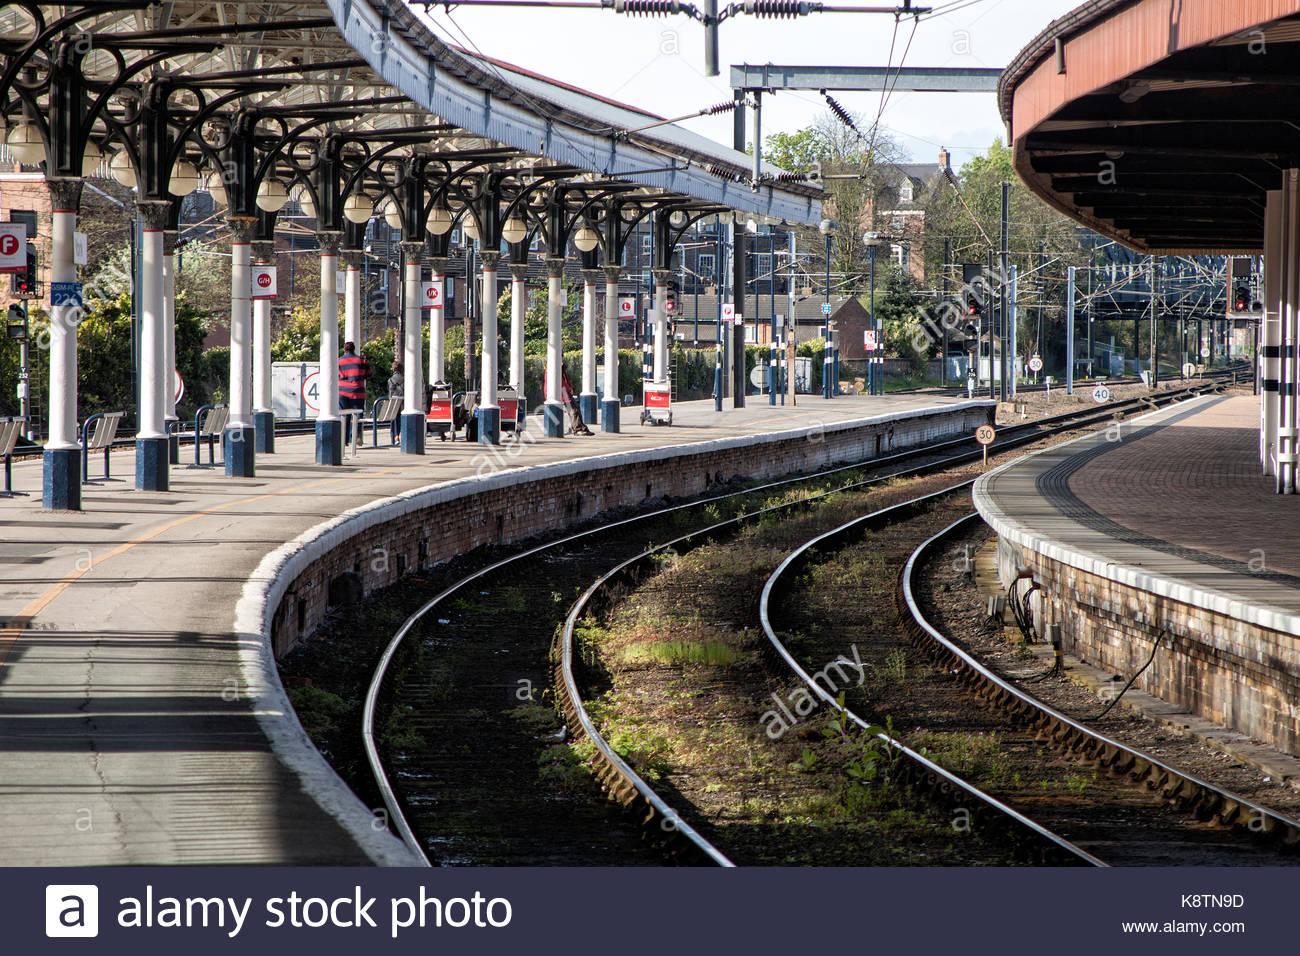 York Railway Station, York - Stock Image